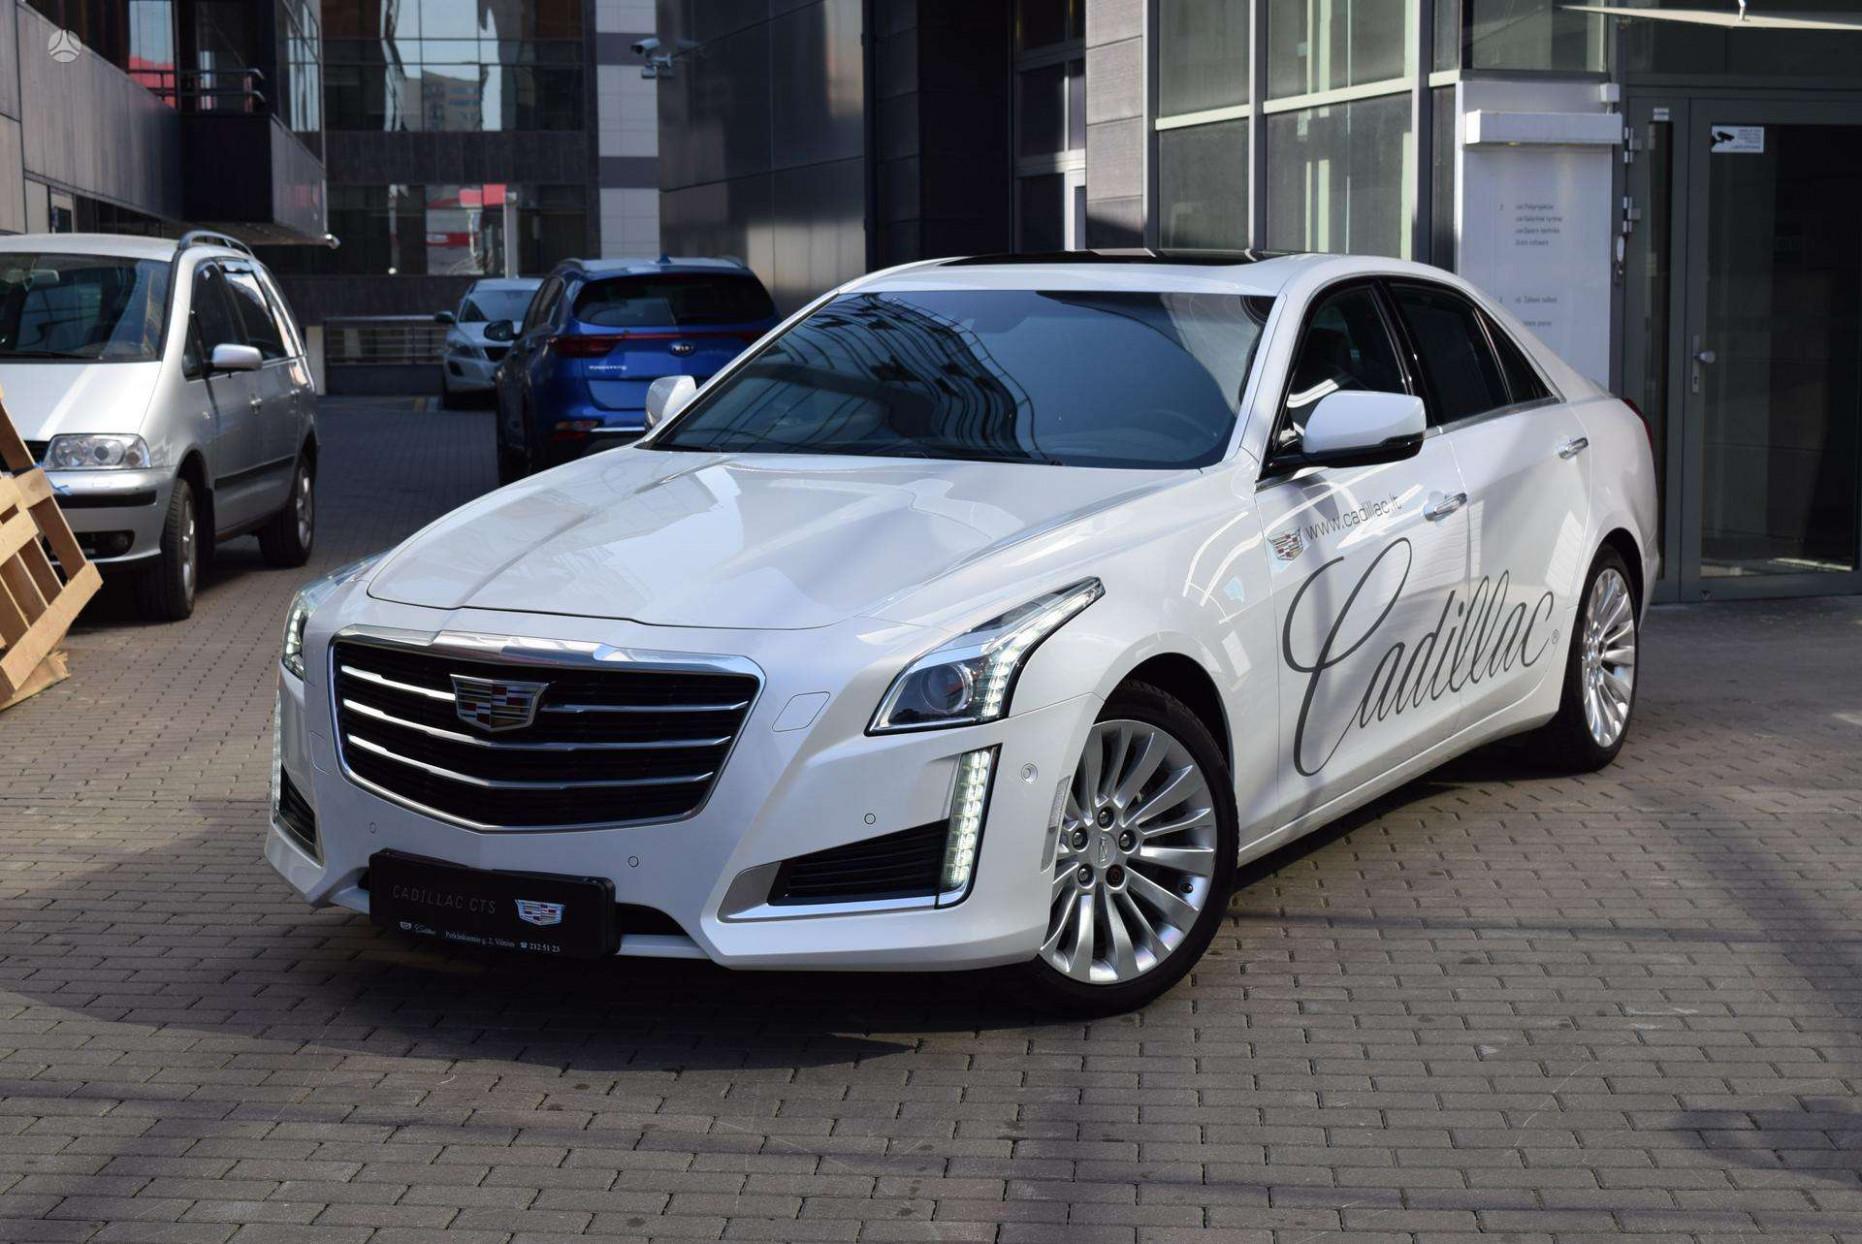 New Concept 2022 Cadillac Ct5 Mpg